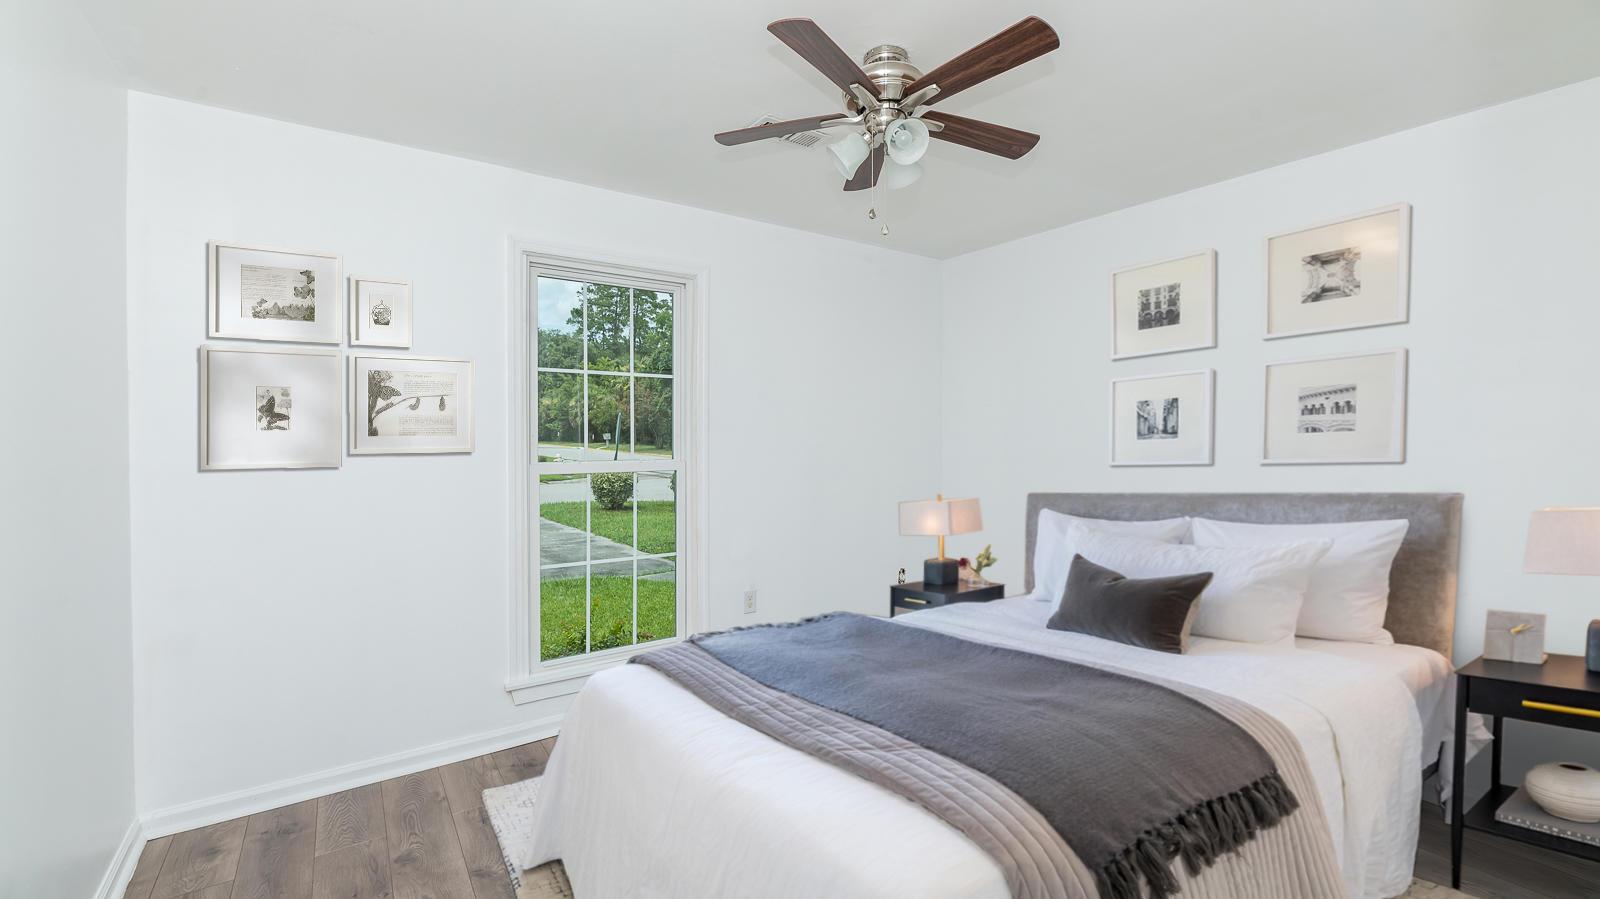 Ashley Villas Homes For Sale - 4315 Briarstone, North Charleston, SC - 15